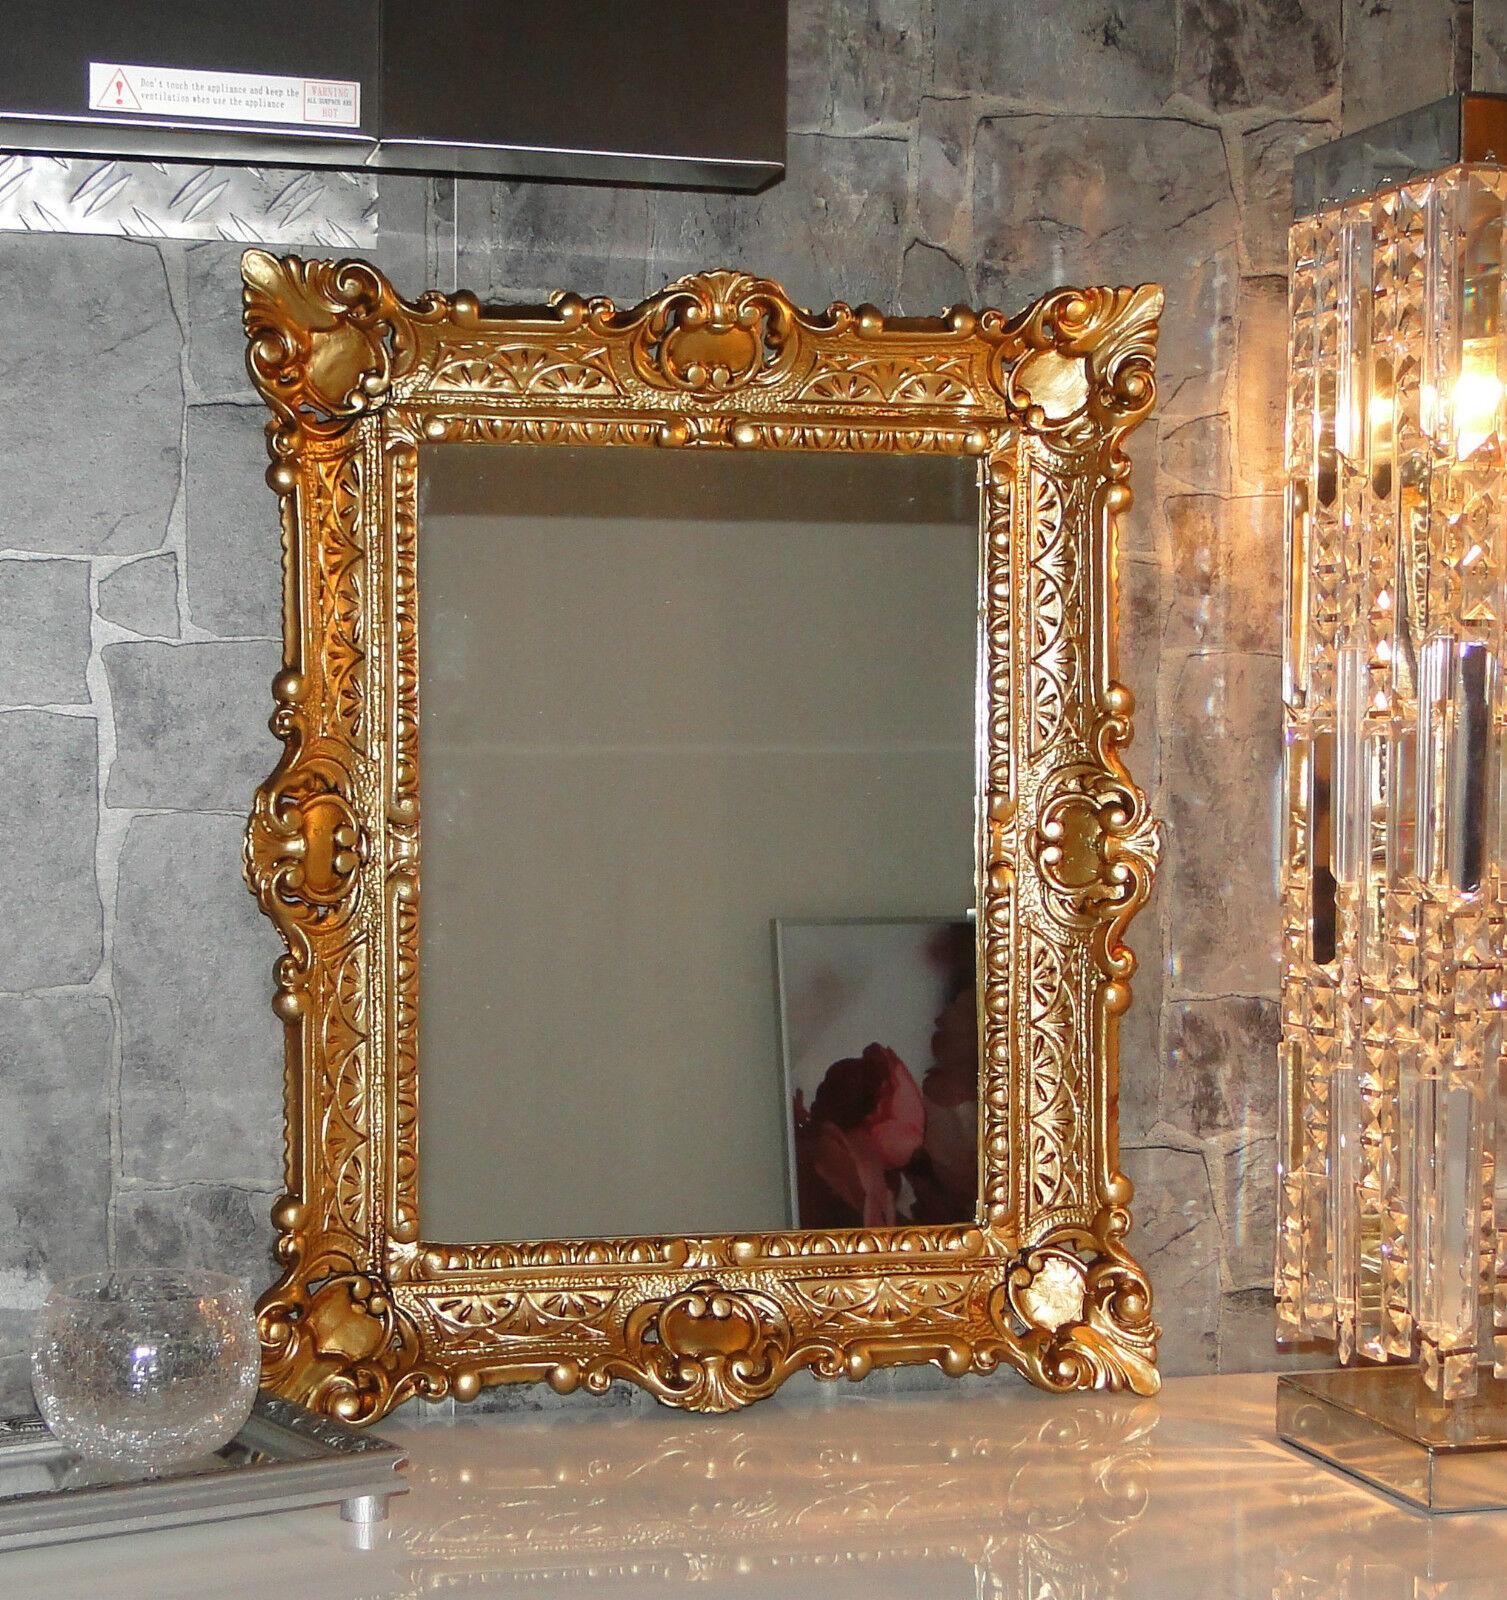 antik barockrahmen bilderrahmen gold 56x46 fotorahmen repro f r foto s 30x40 cm ebay. Black Bedroom Furniture Sets. Home Design Ideas